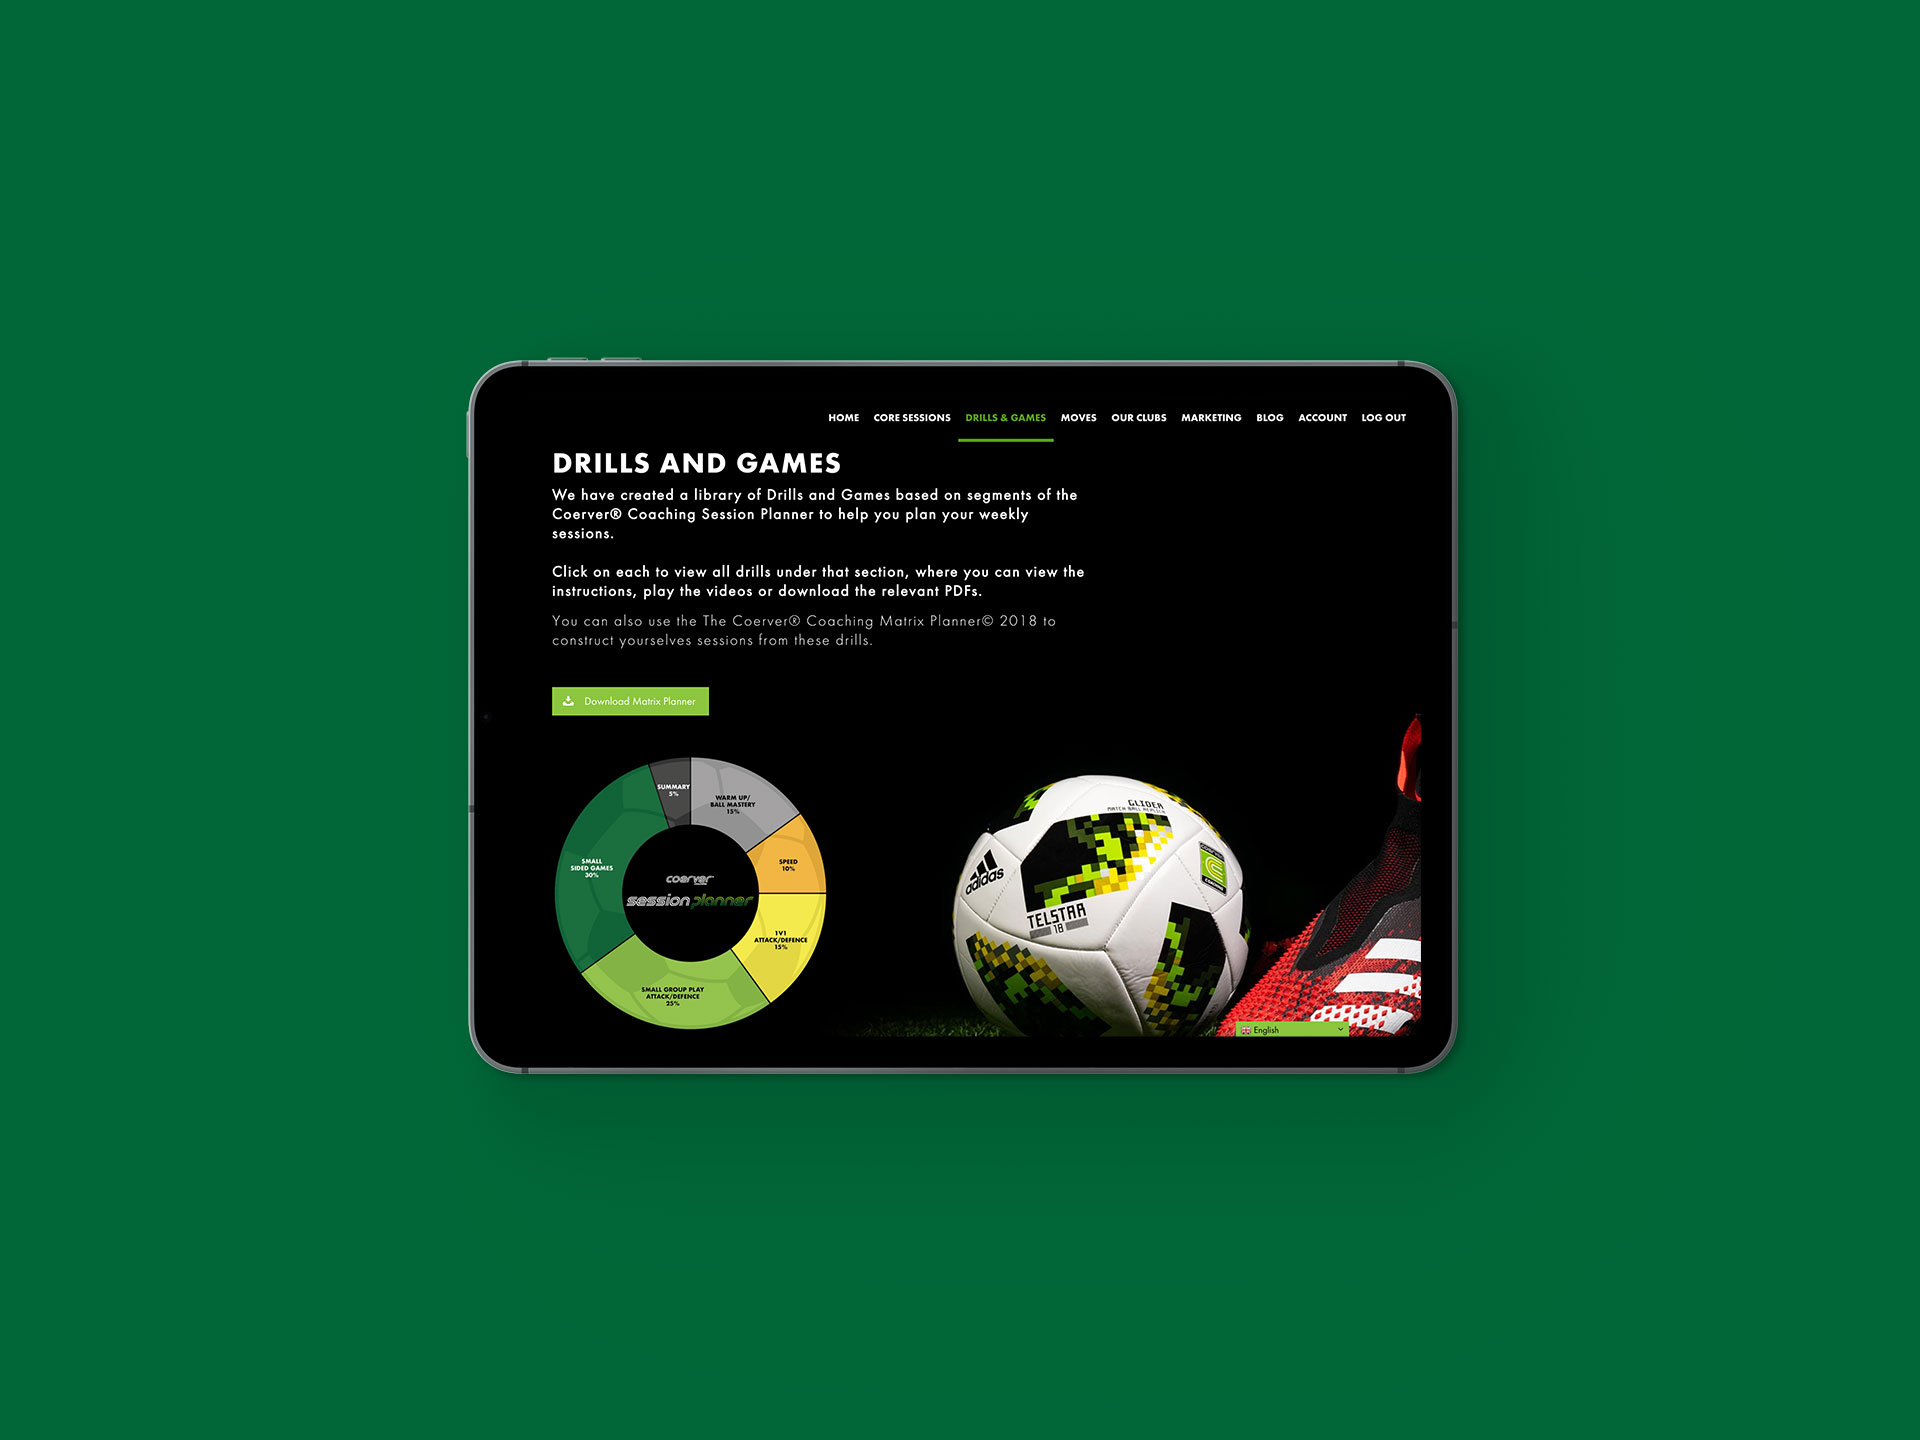 Coerver Partner Club Website Drills